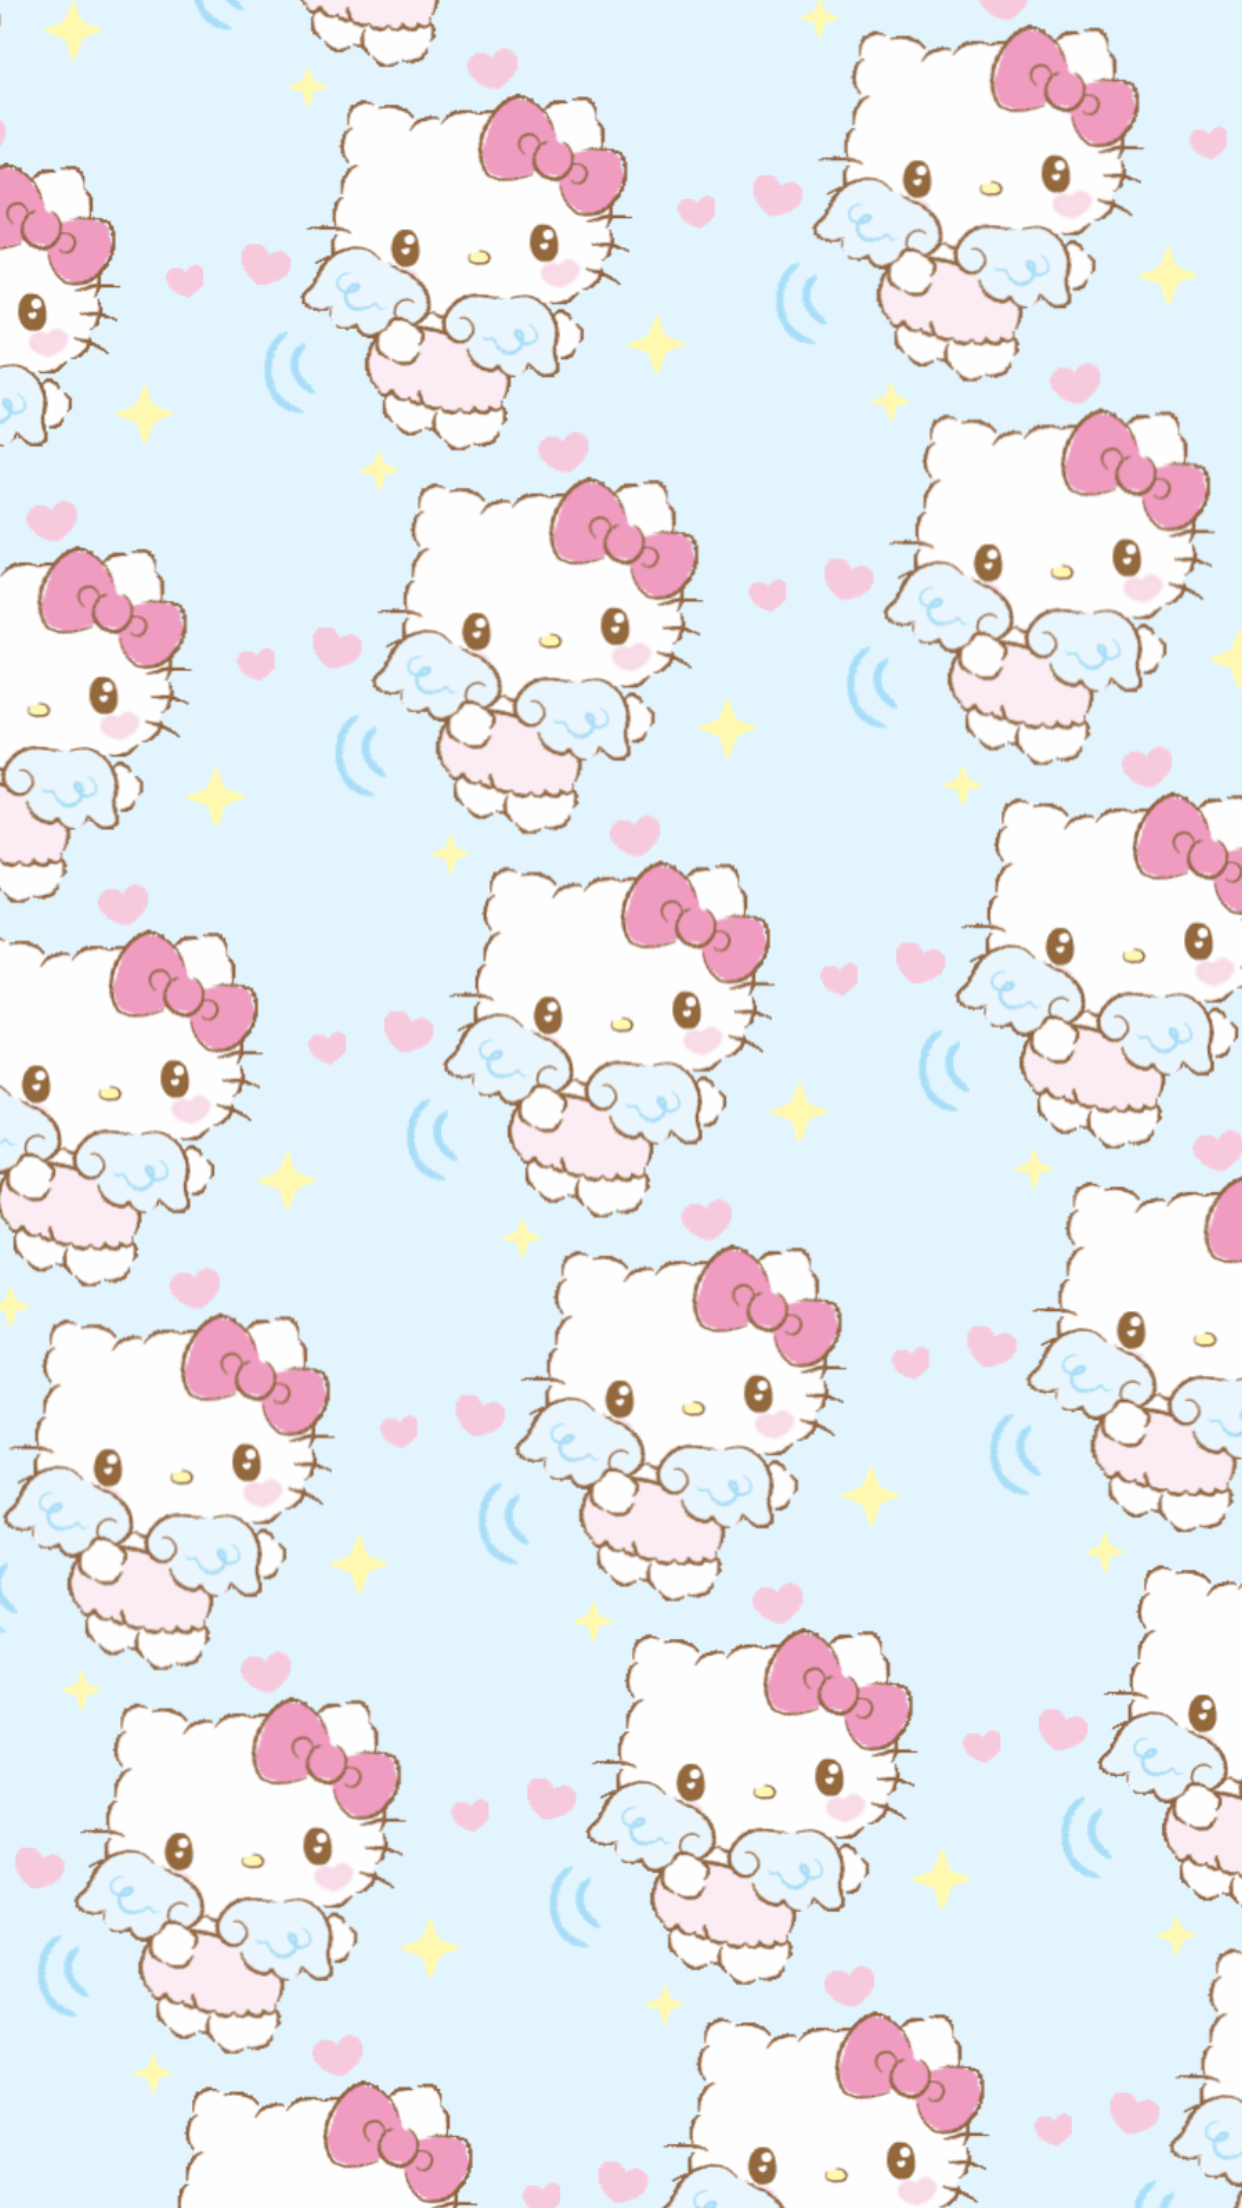 Hello Kitty Aesthetic Background : hello, kitty, aesthetic, background, Background, Hello, Kitty, Aesthetic, Wallpaper, HomeLooker